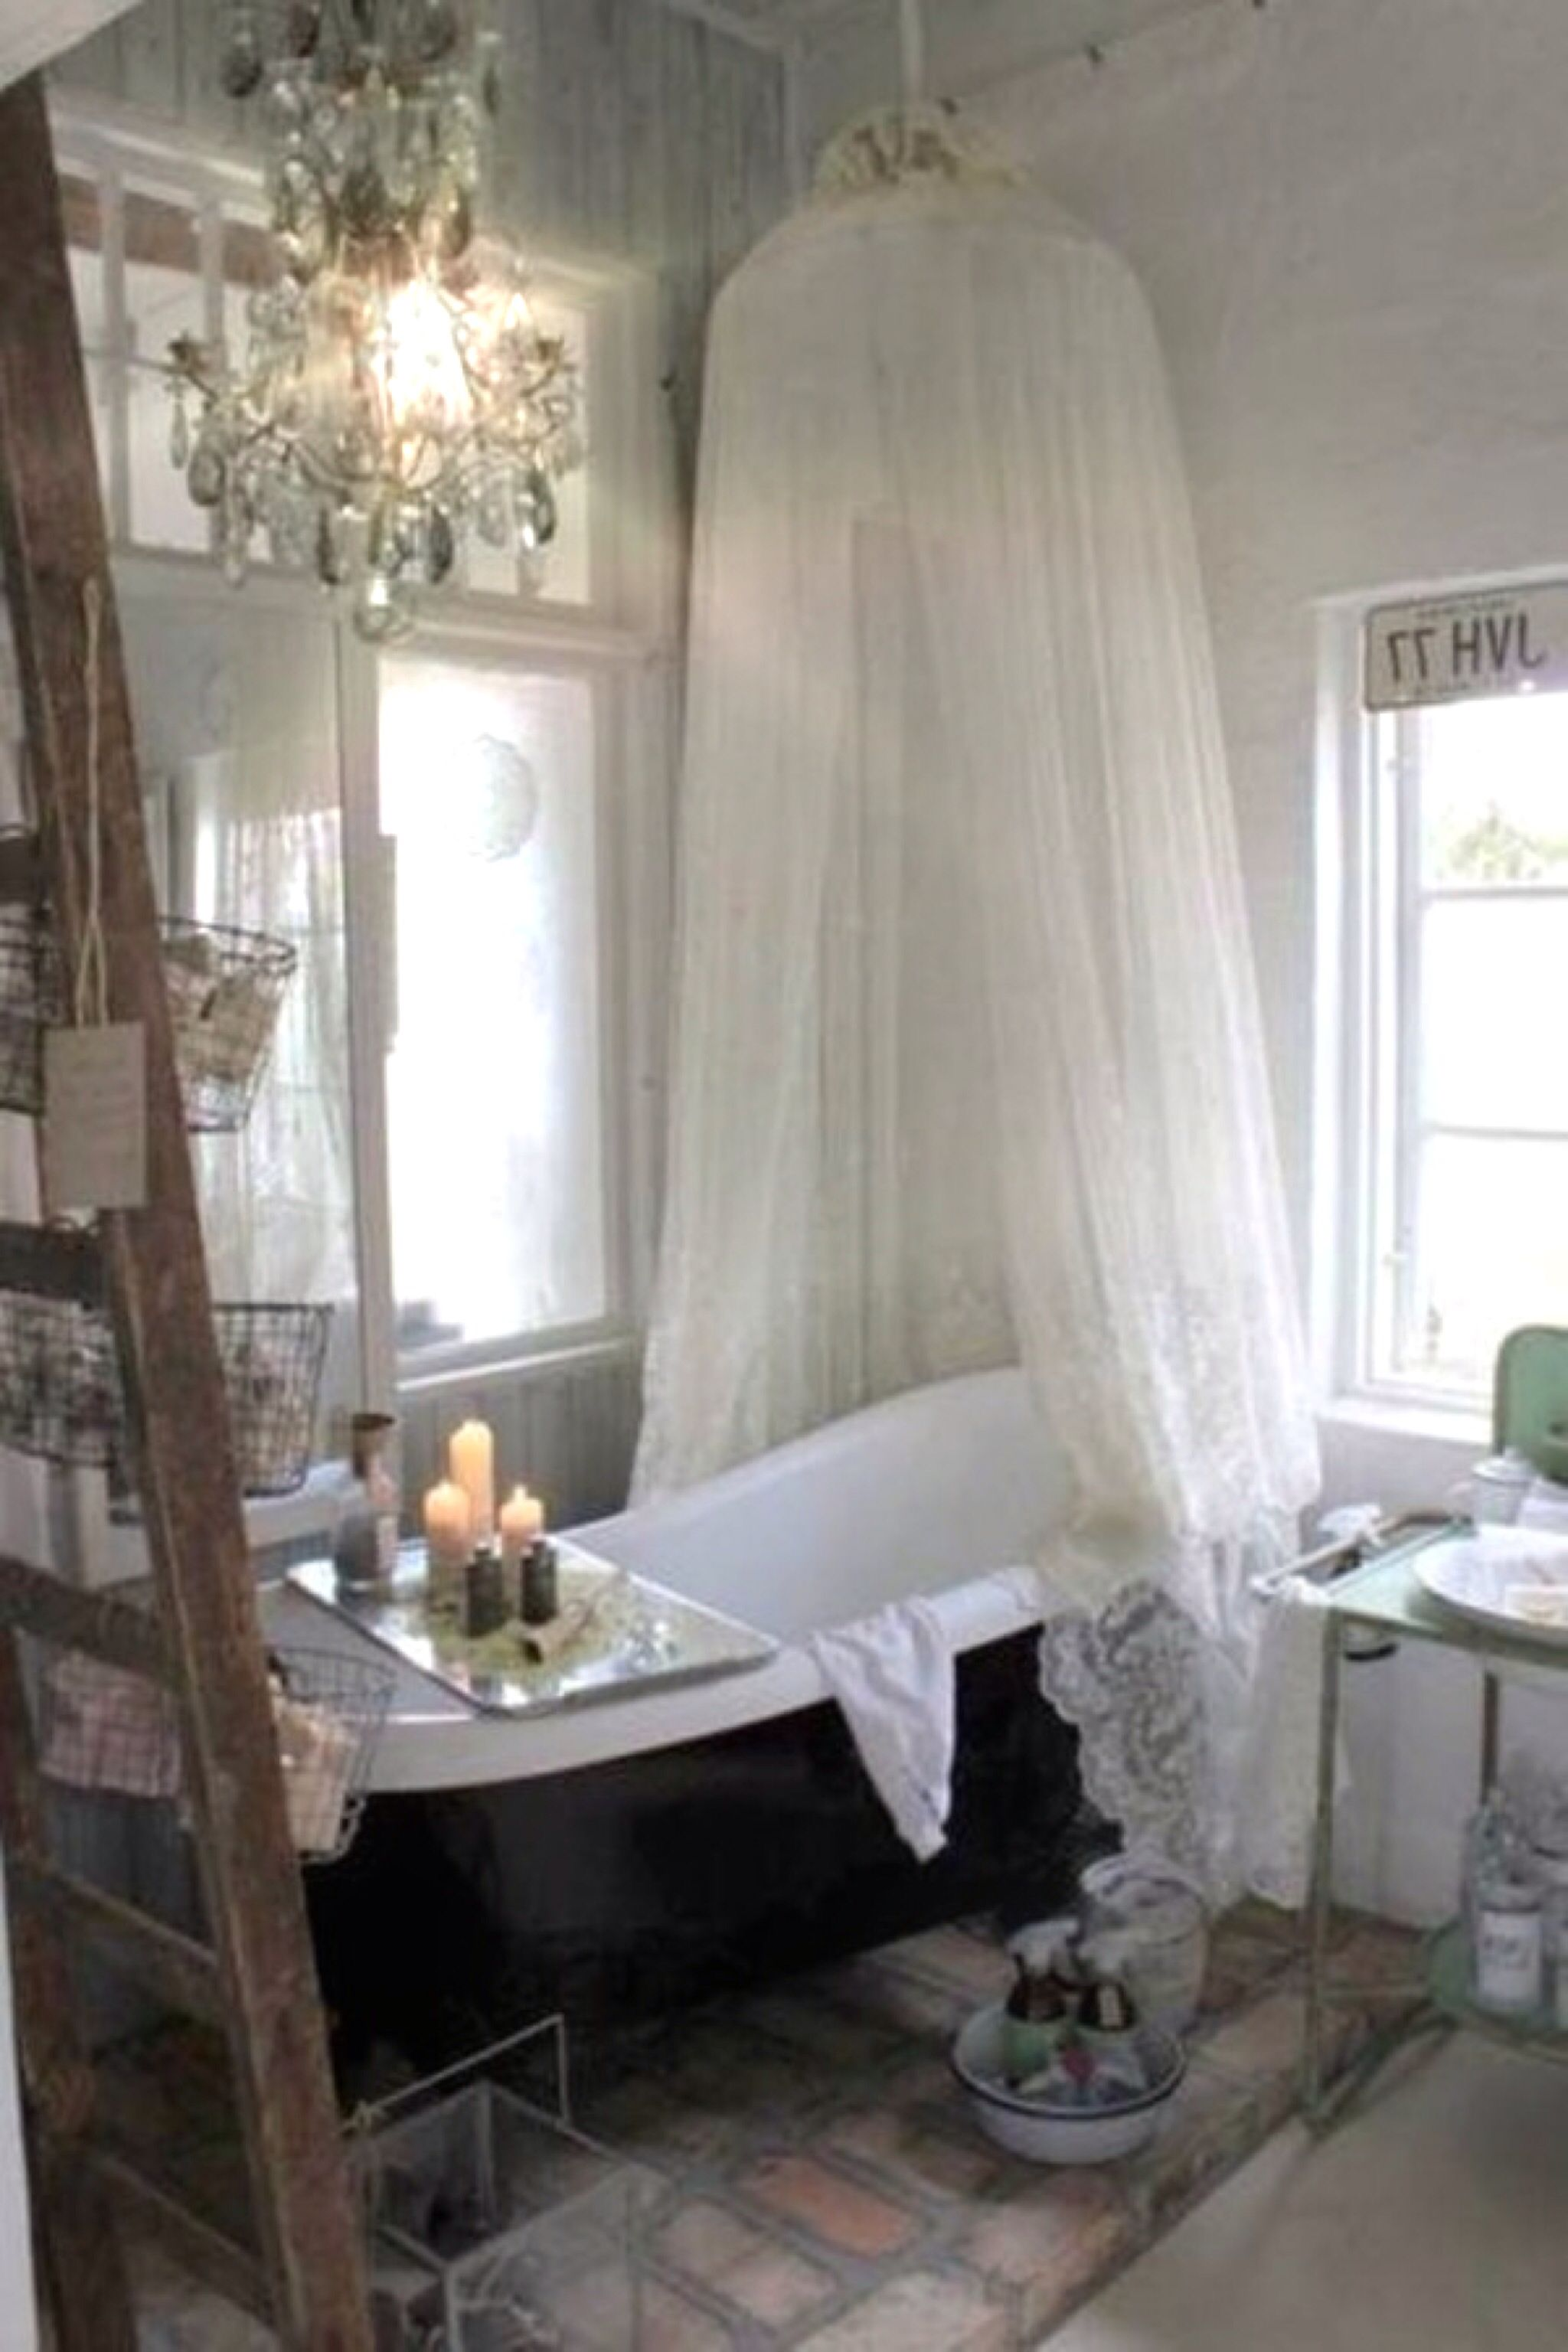 Shabby chic bathroom lighting - Shabby Chic Bathroom Lighting 50